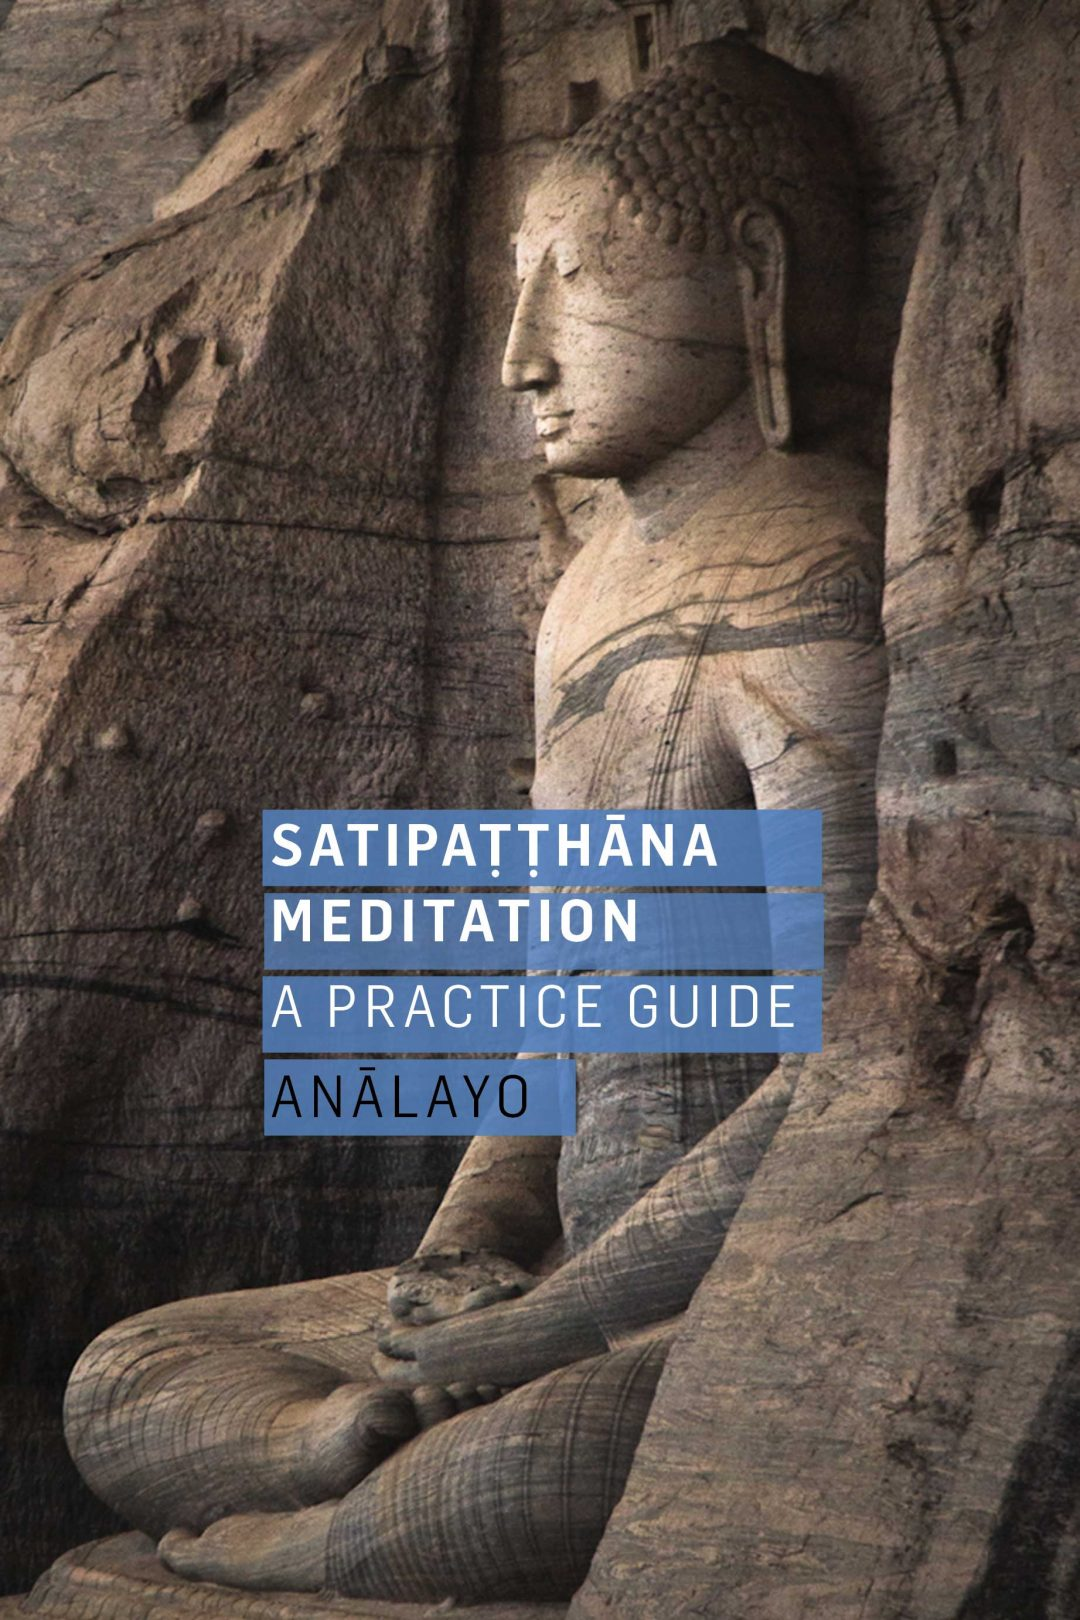 Analayo - Satipatthana Meditation - a practice guide